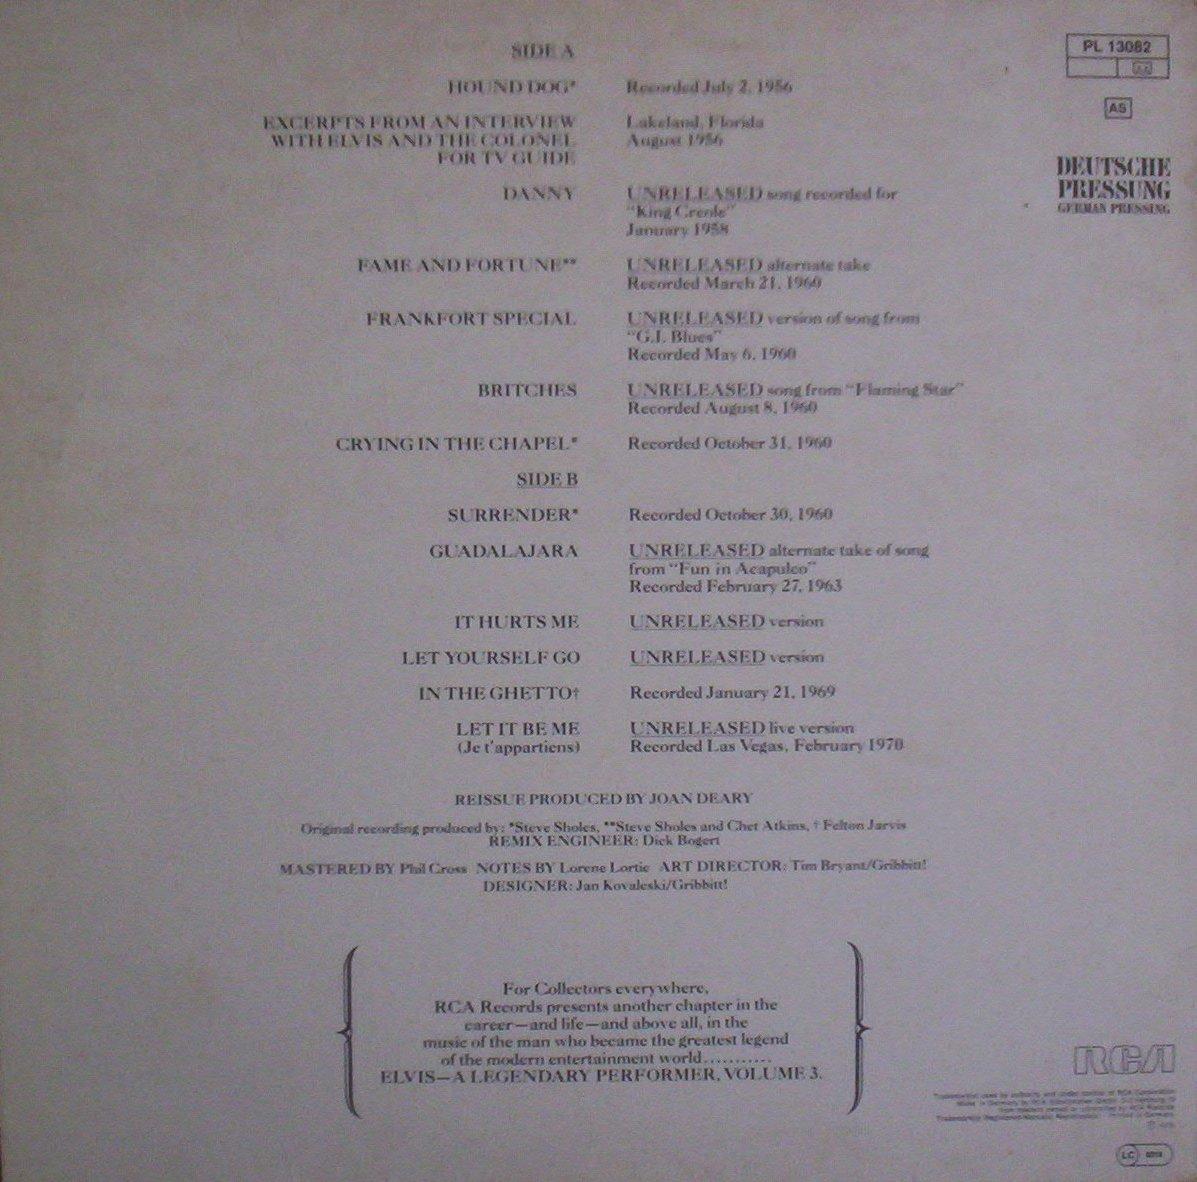 A LEGENDARY PERFORMER - VOLUME 3 100_9613usjrz